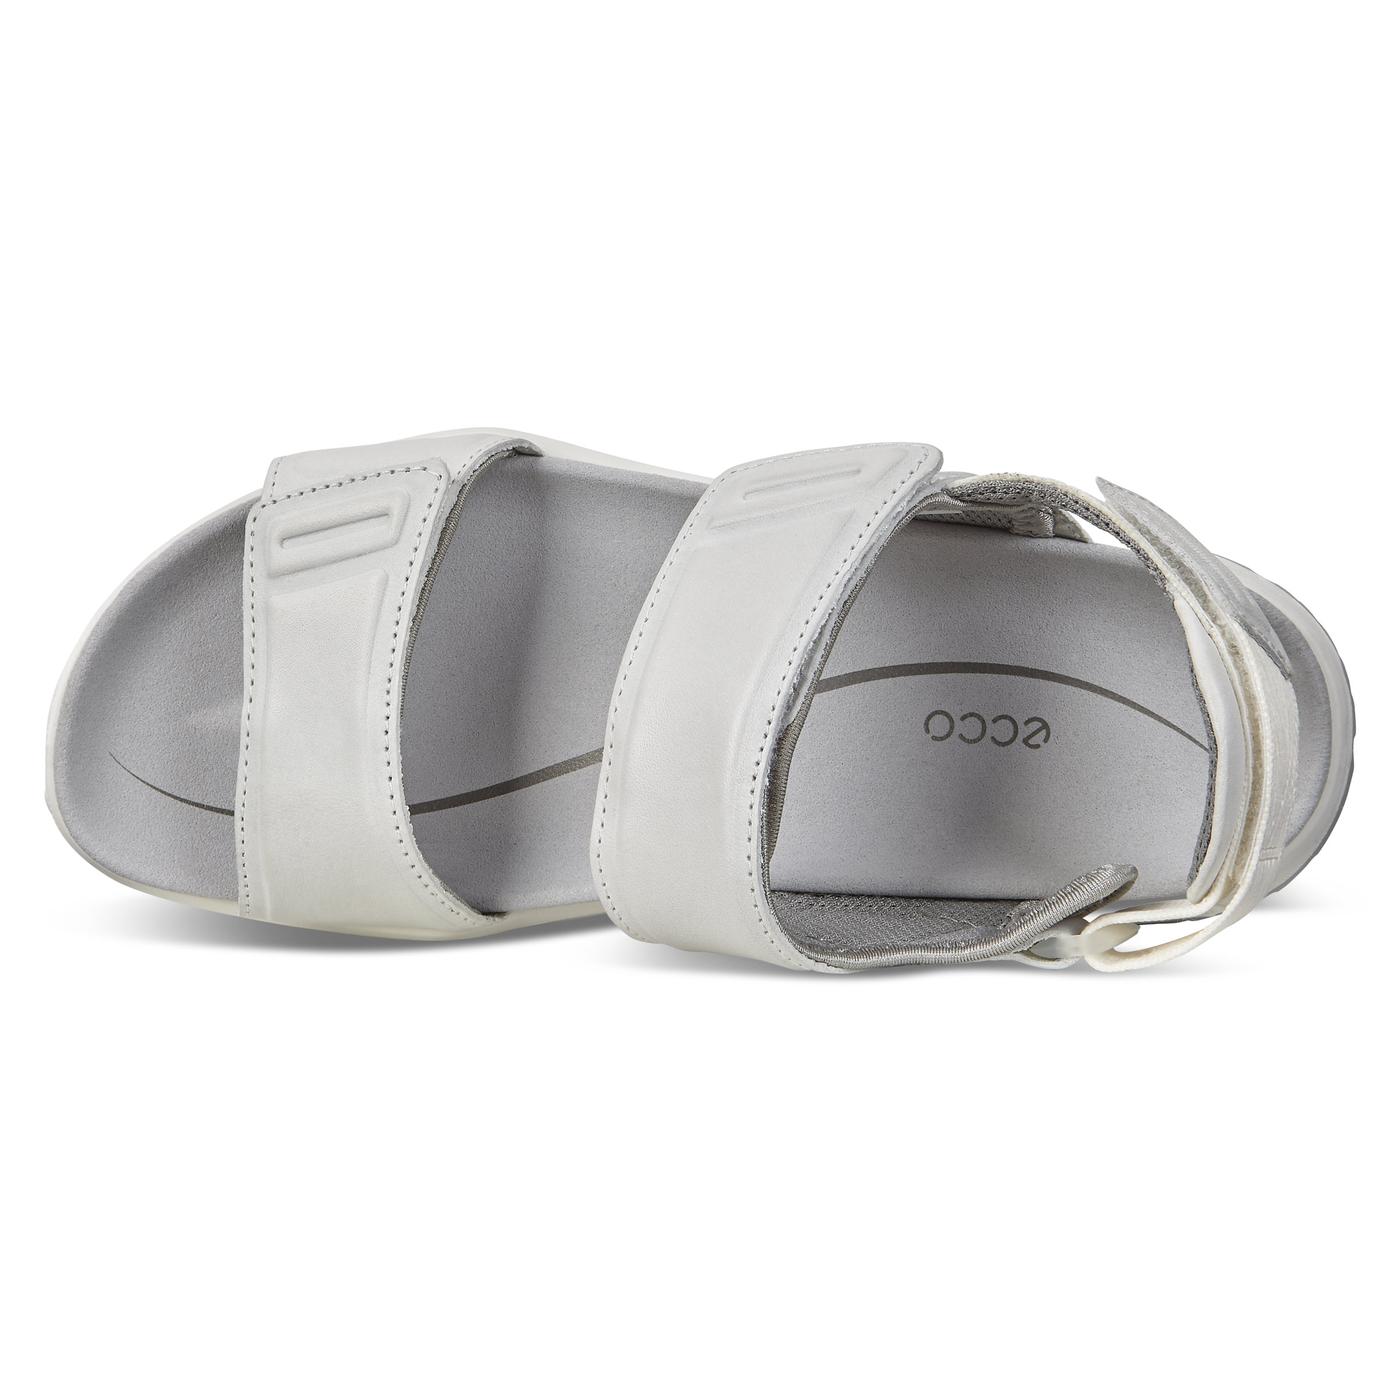 ECCO X-TRINSIC Womens Flat Sandal